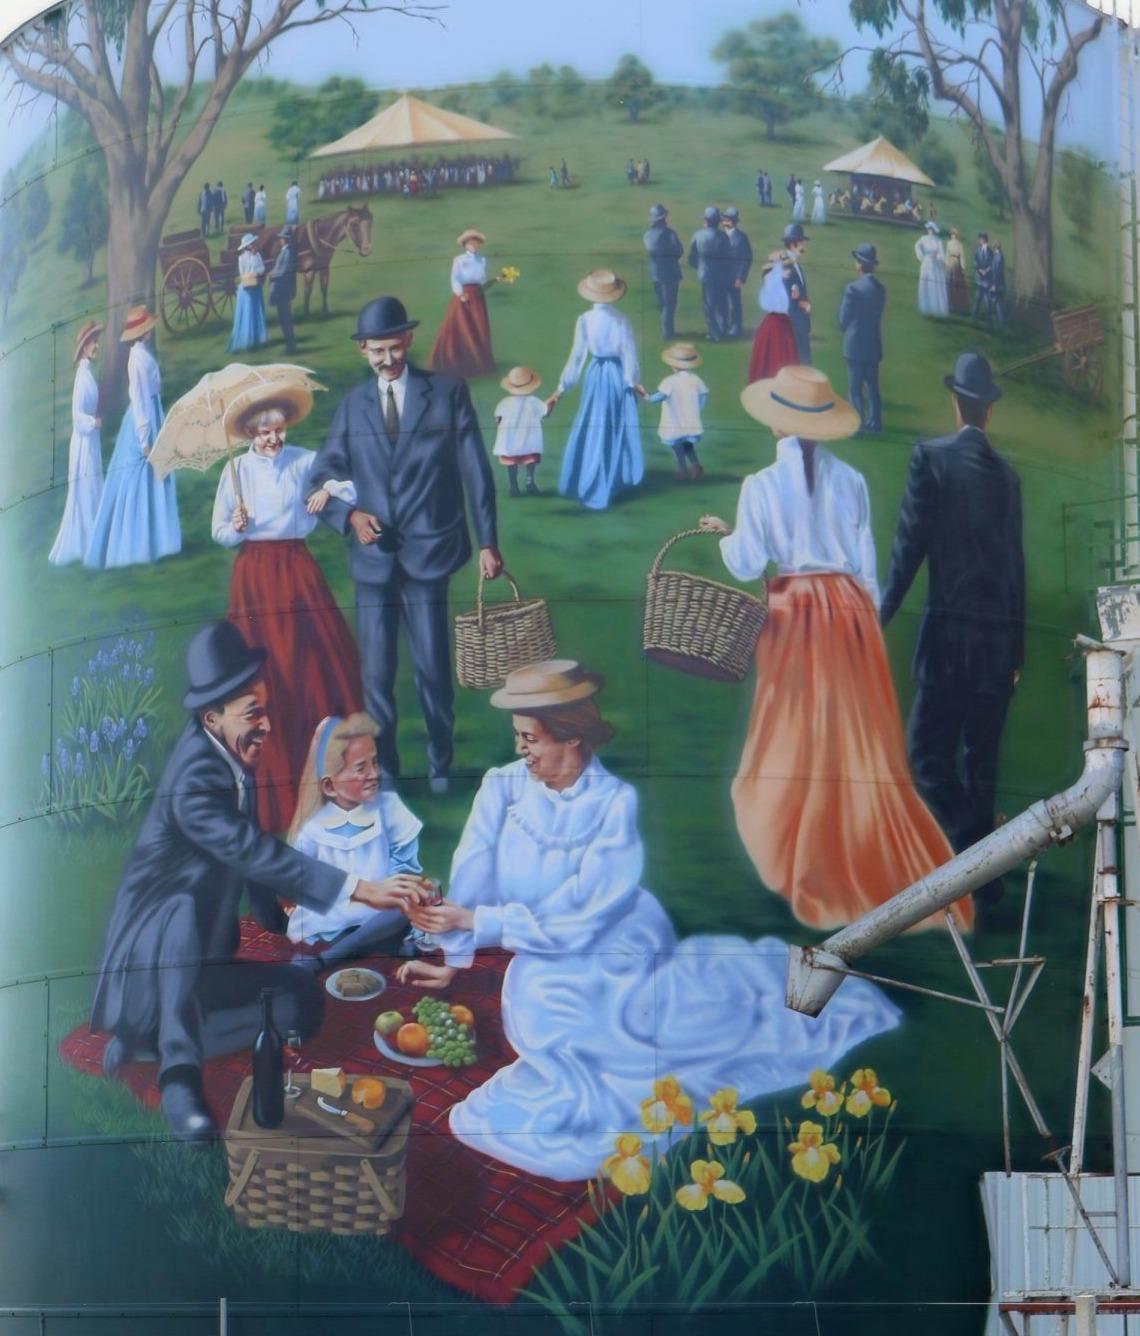 The Colbinabbin Farmers Picnic